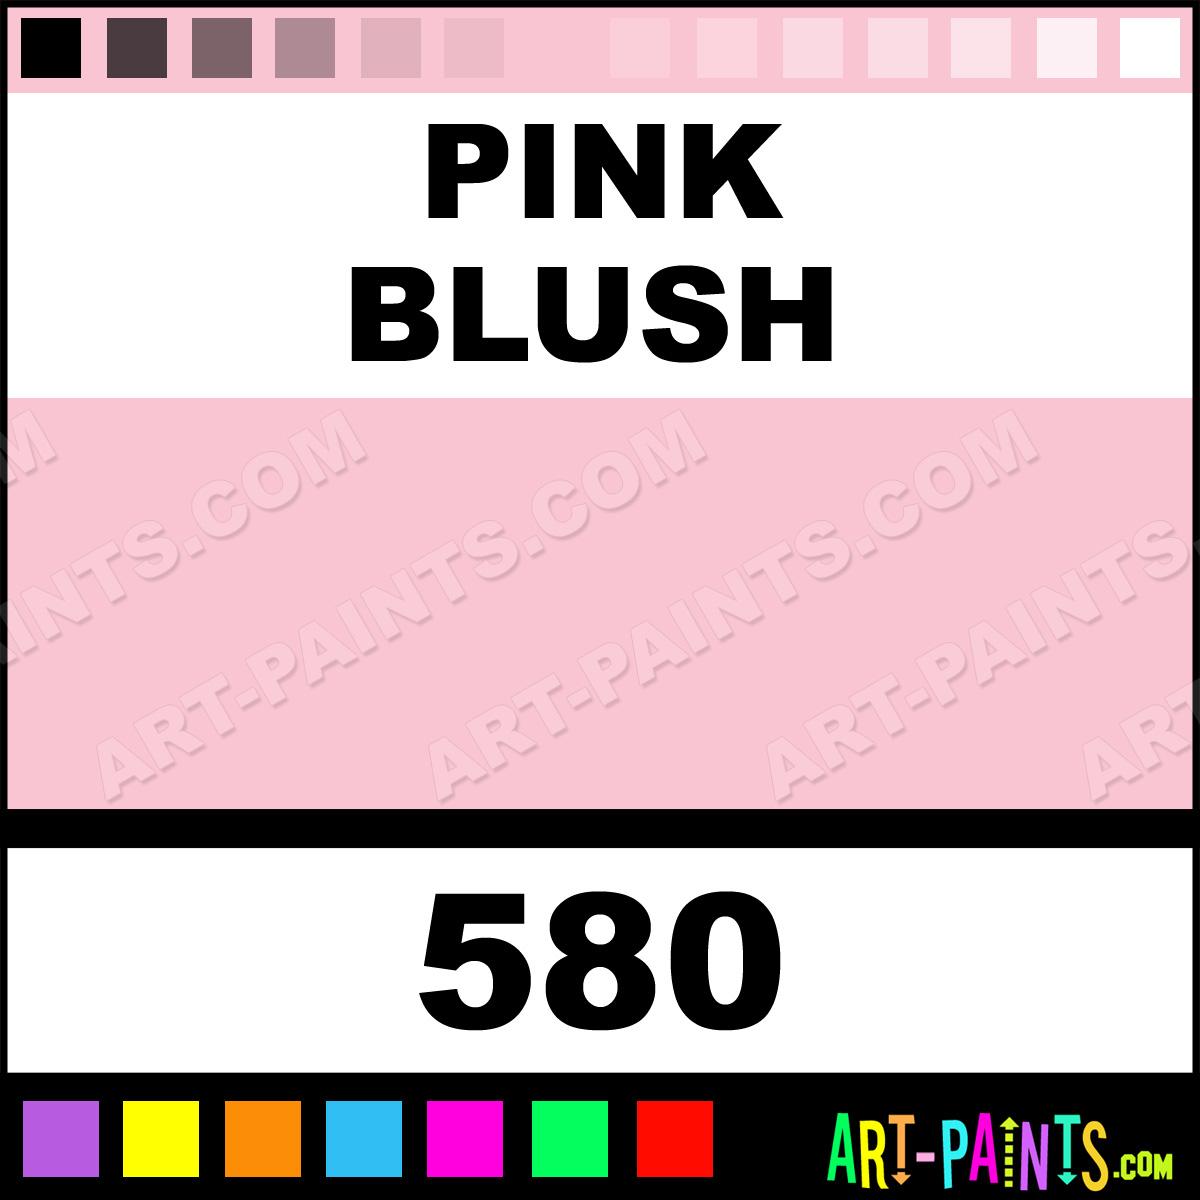 pink blush system3 acrylic paints 580 pink blush paint. Black Bedroom Furniture Sets. Home Design Ideas